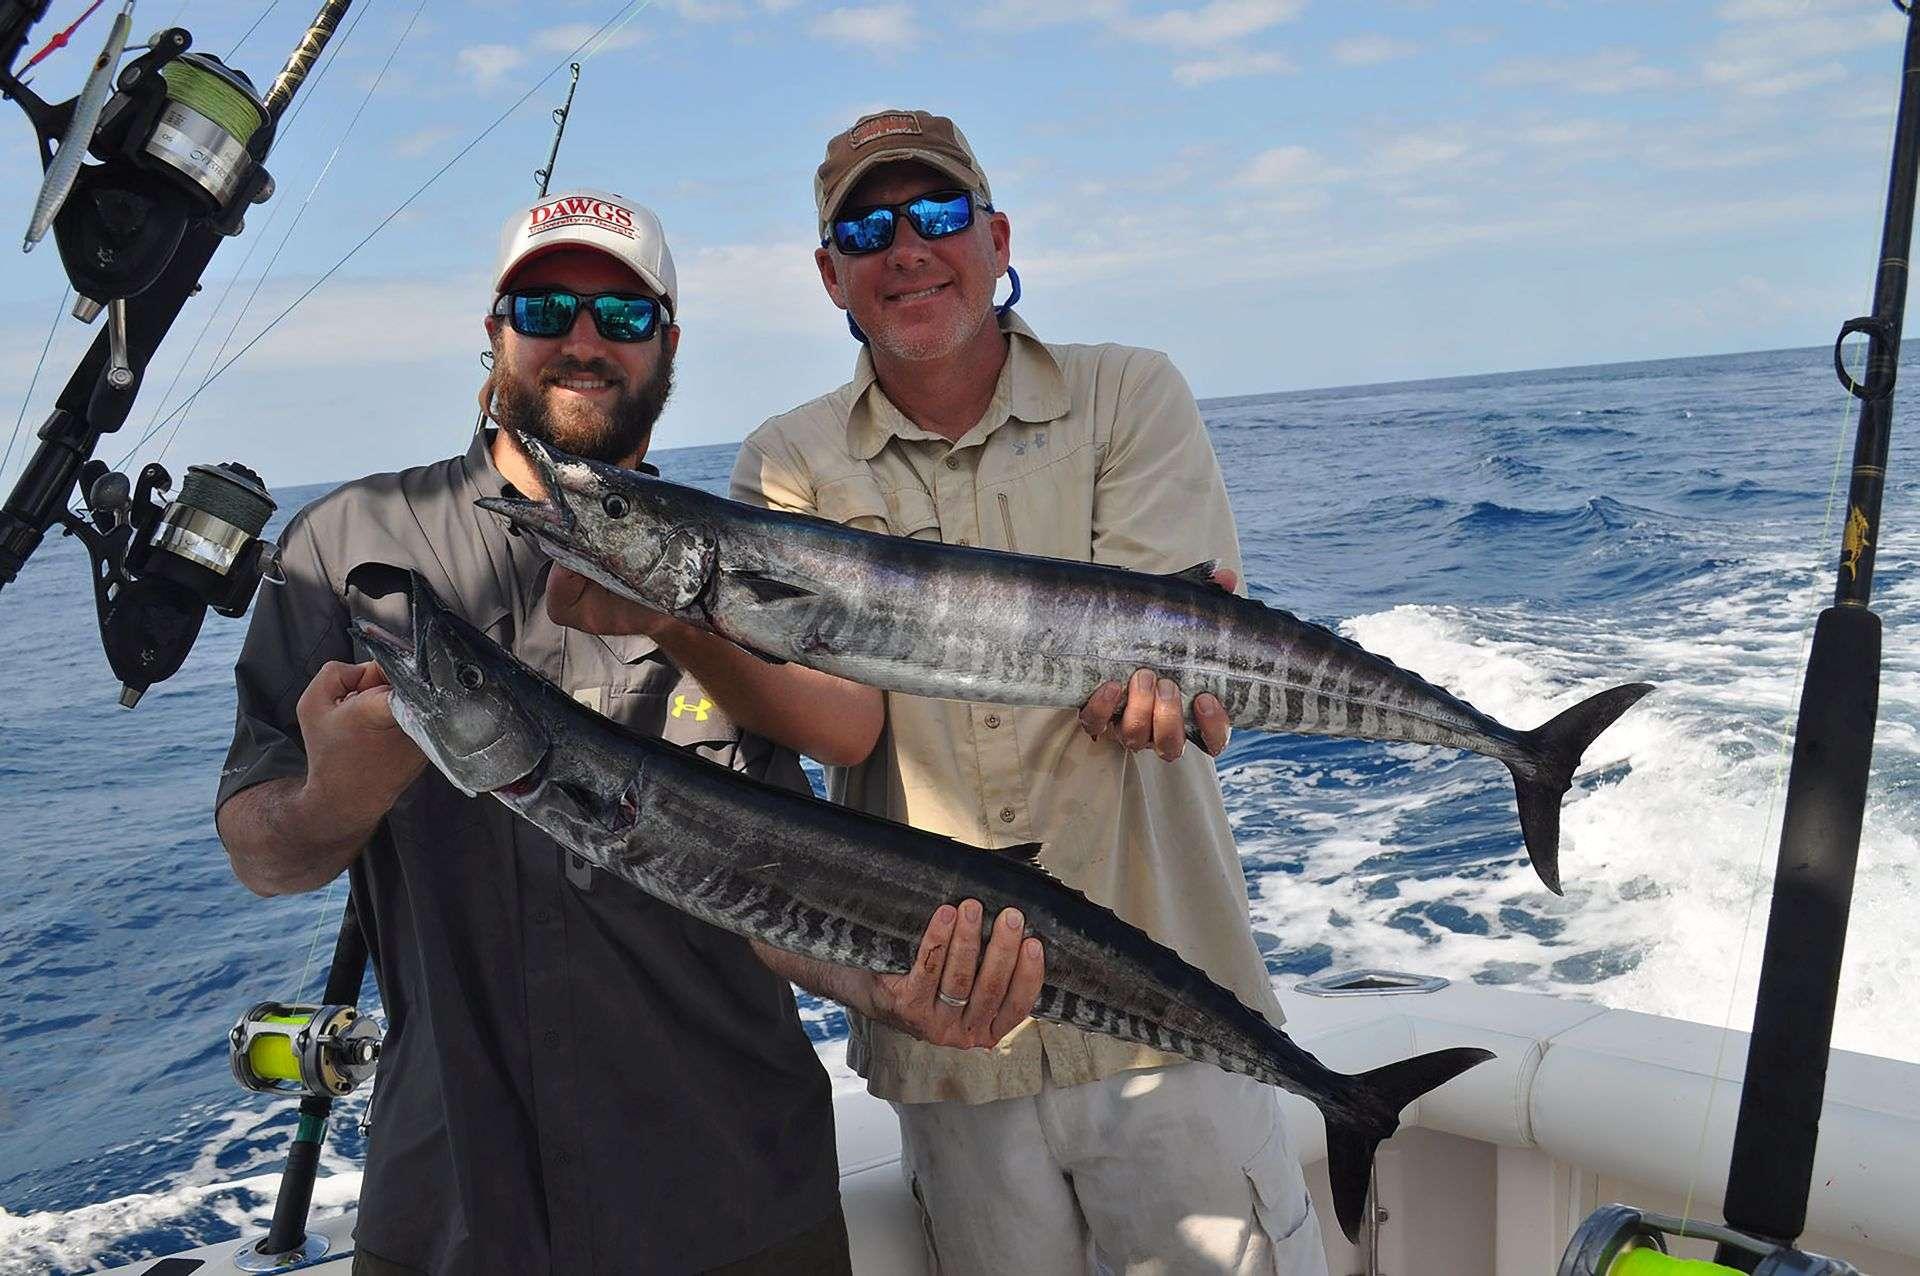 Sport fishing - pesca deportiva,Bahía de Drake, Drake Bay,